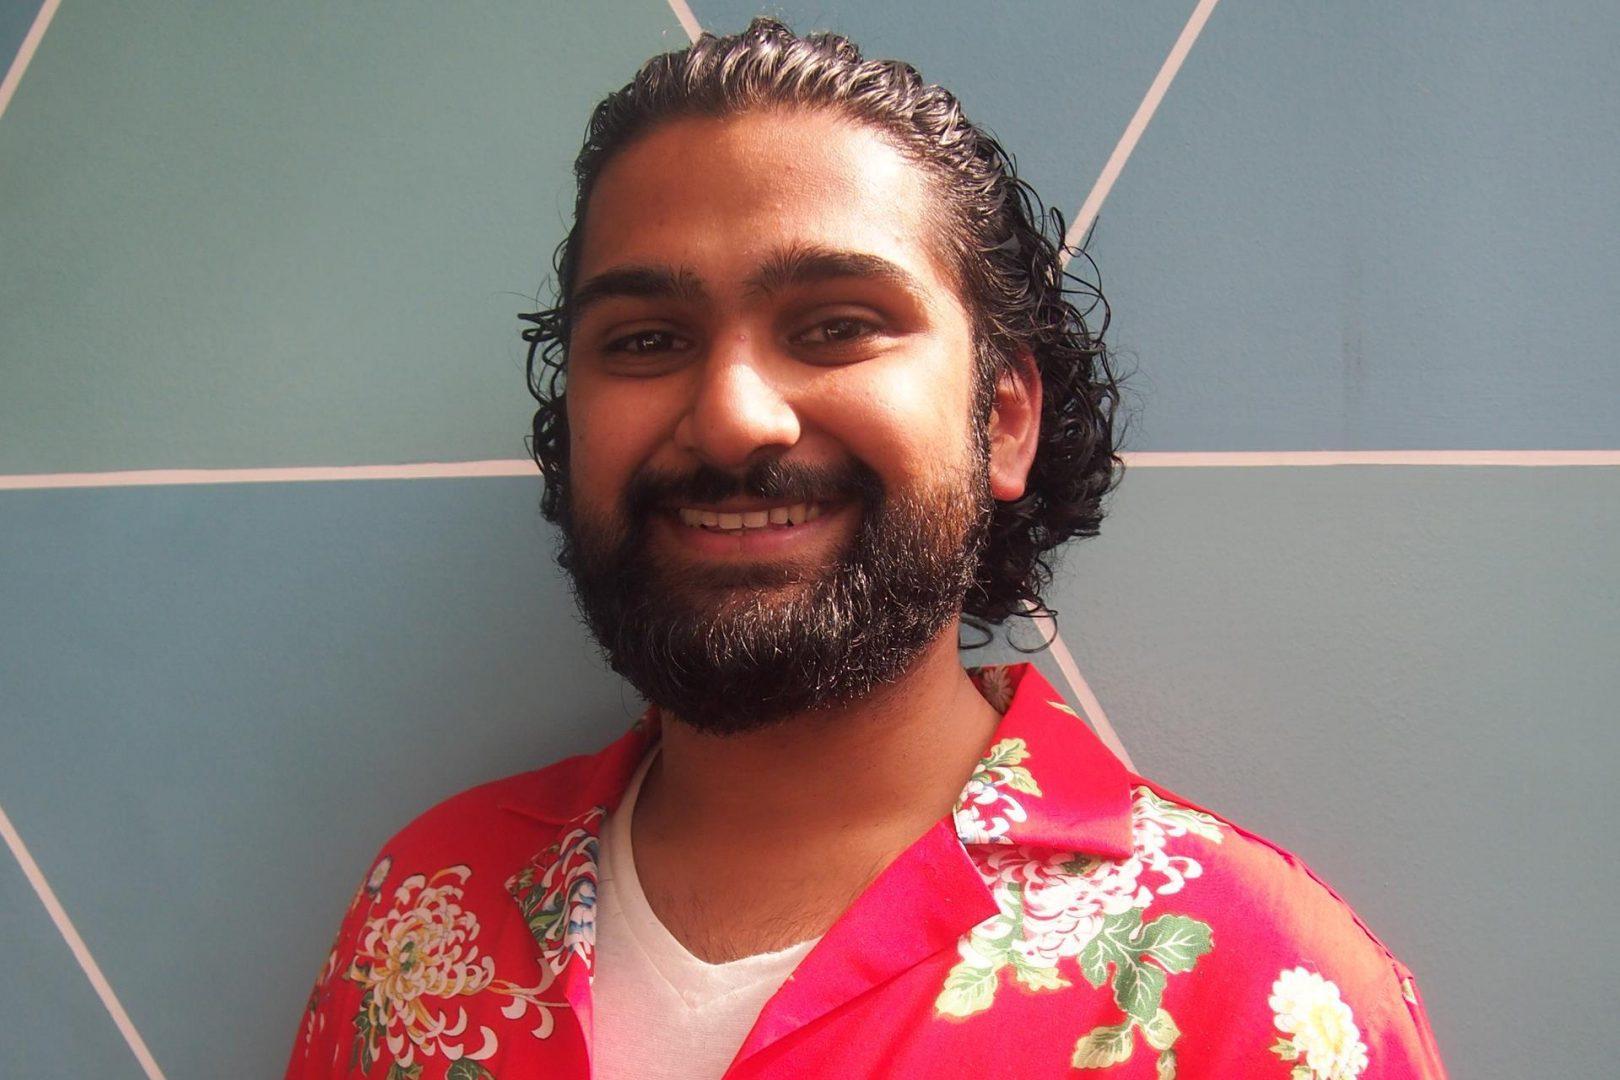 Aamar Aslam